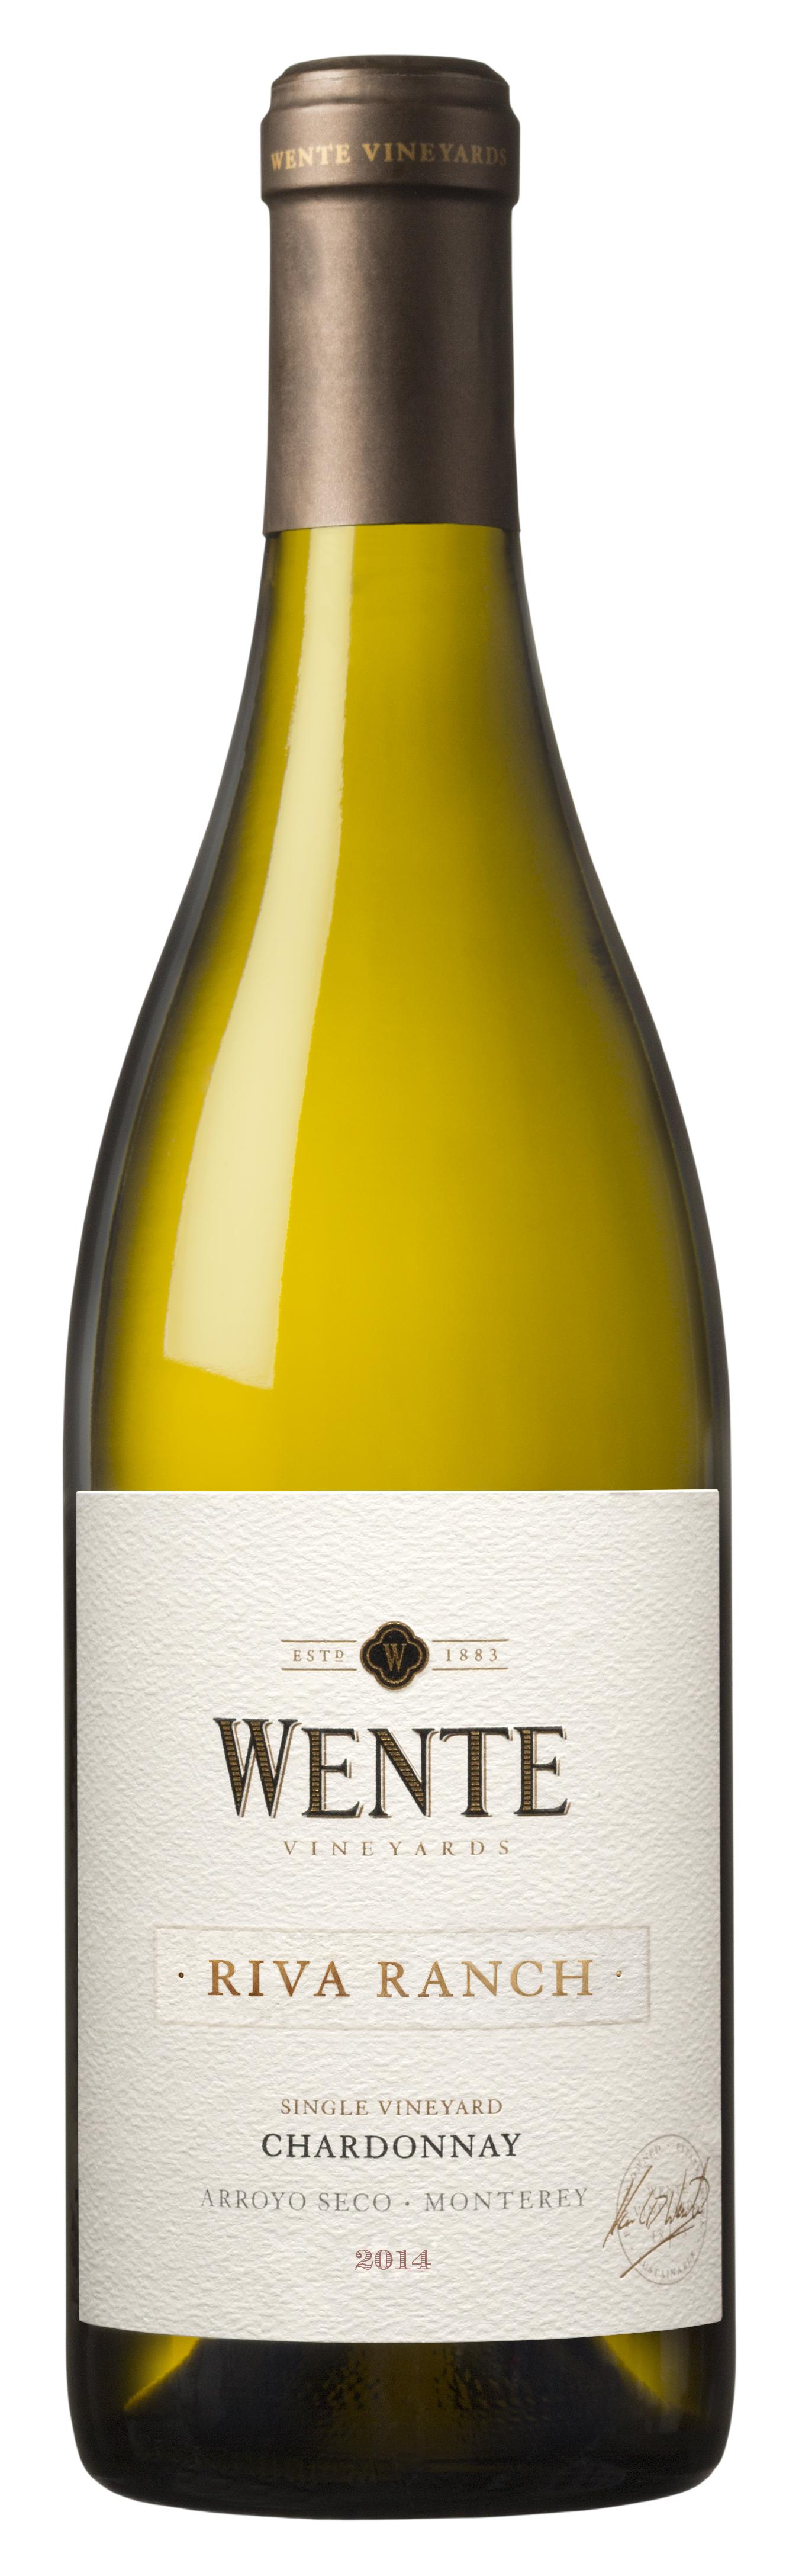 2014 Riva Ranch Chardonnay